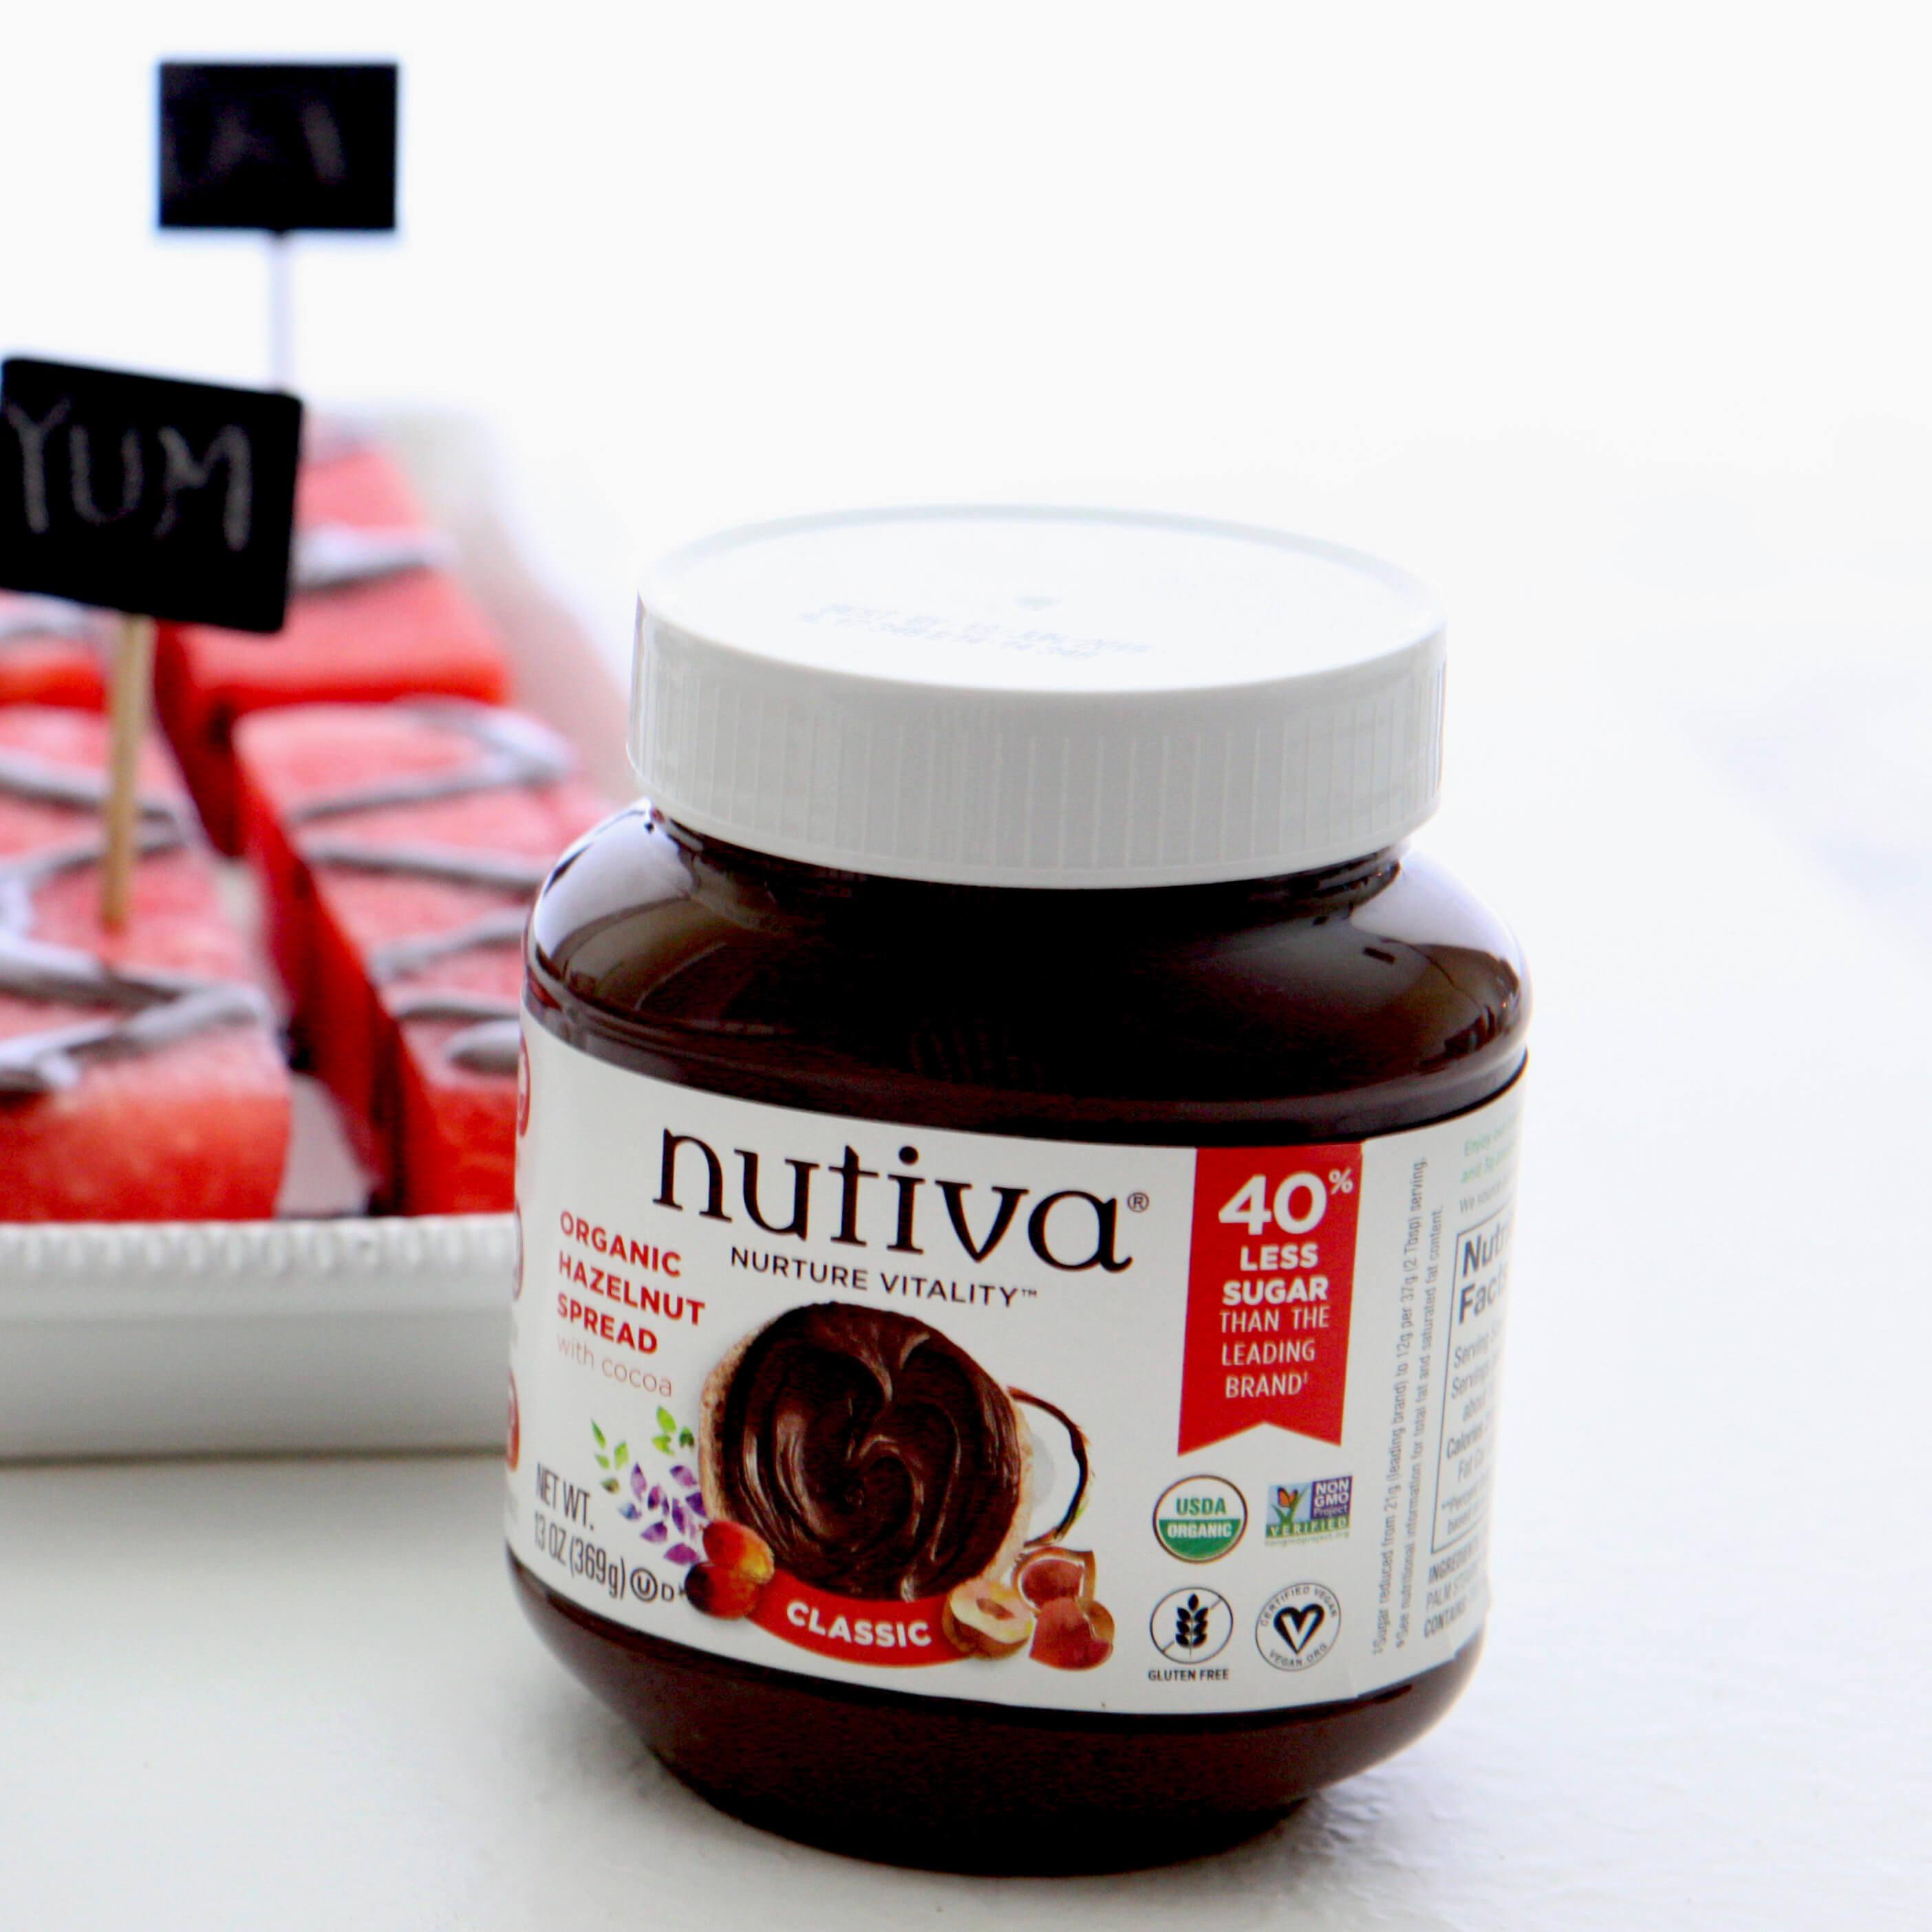 36 Gluten-Free Items from Thrive Market Nutiva Organic Classic hazelnut Spread www.agutsygirl.com #thrivemarket #glutenfree #vegan #guthealth #healthyliving